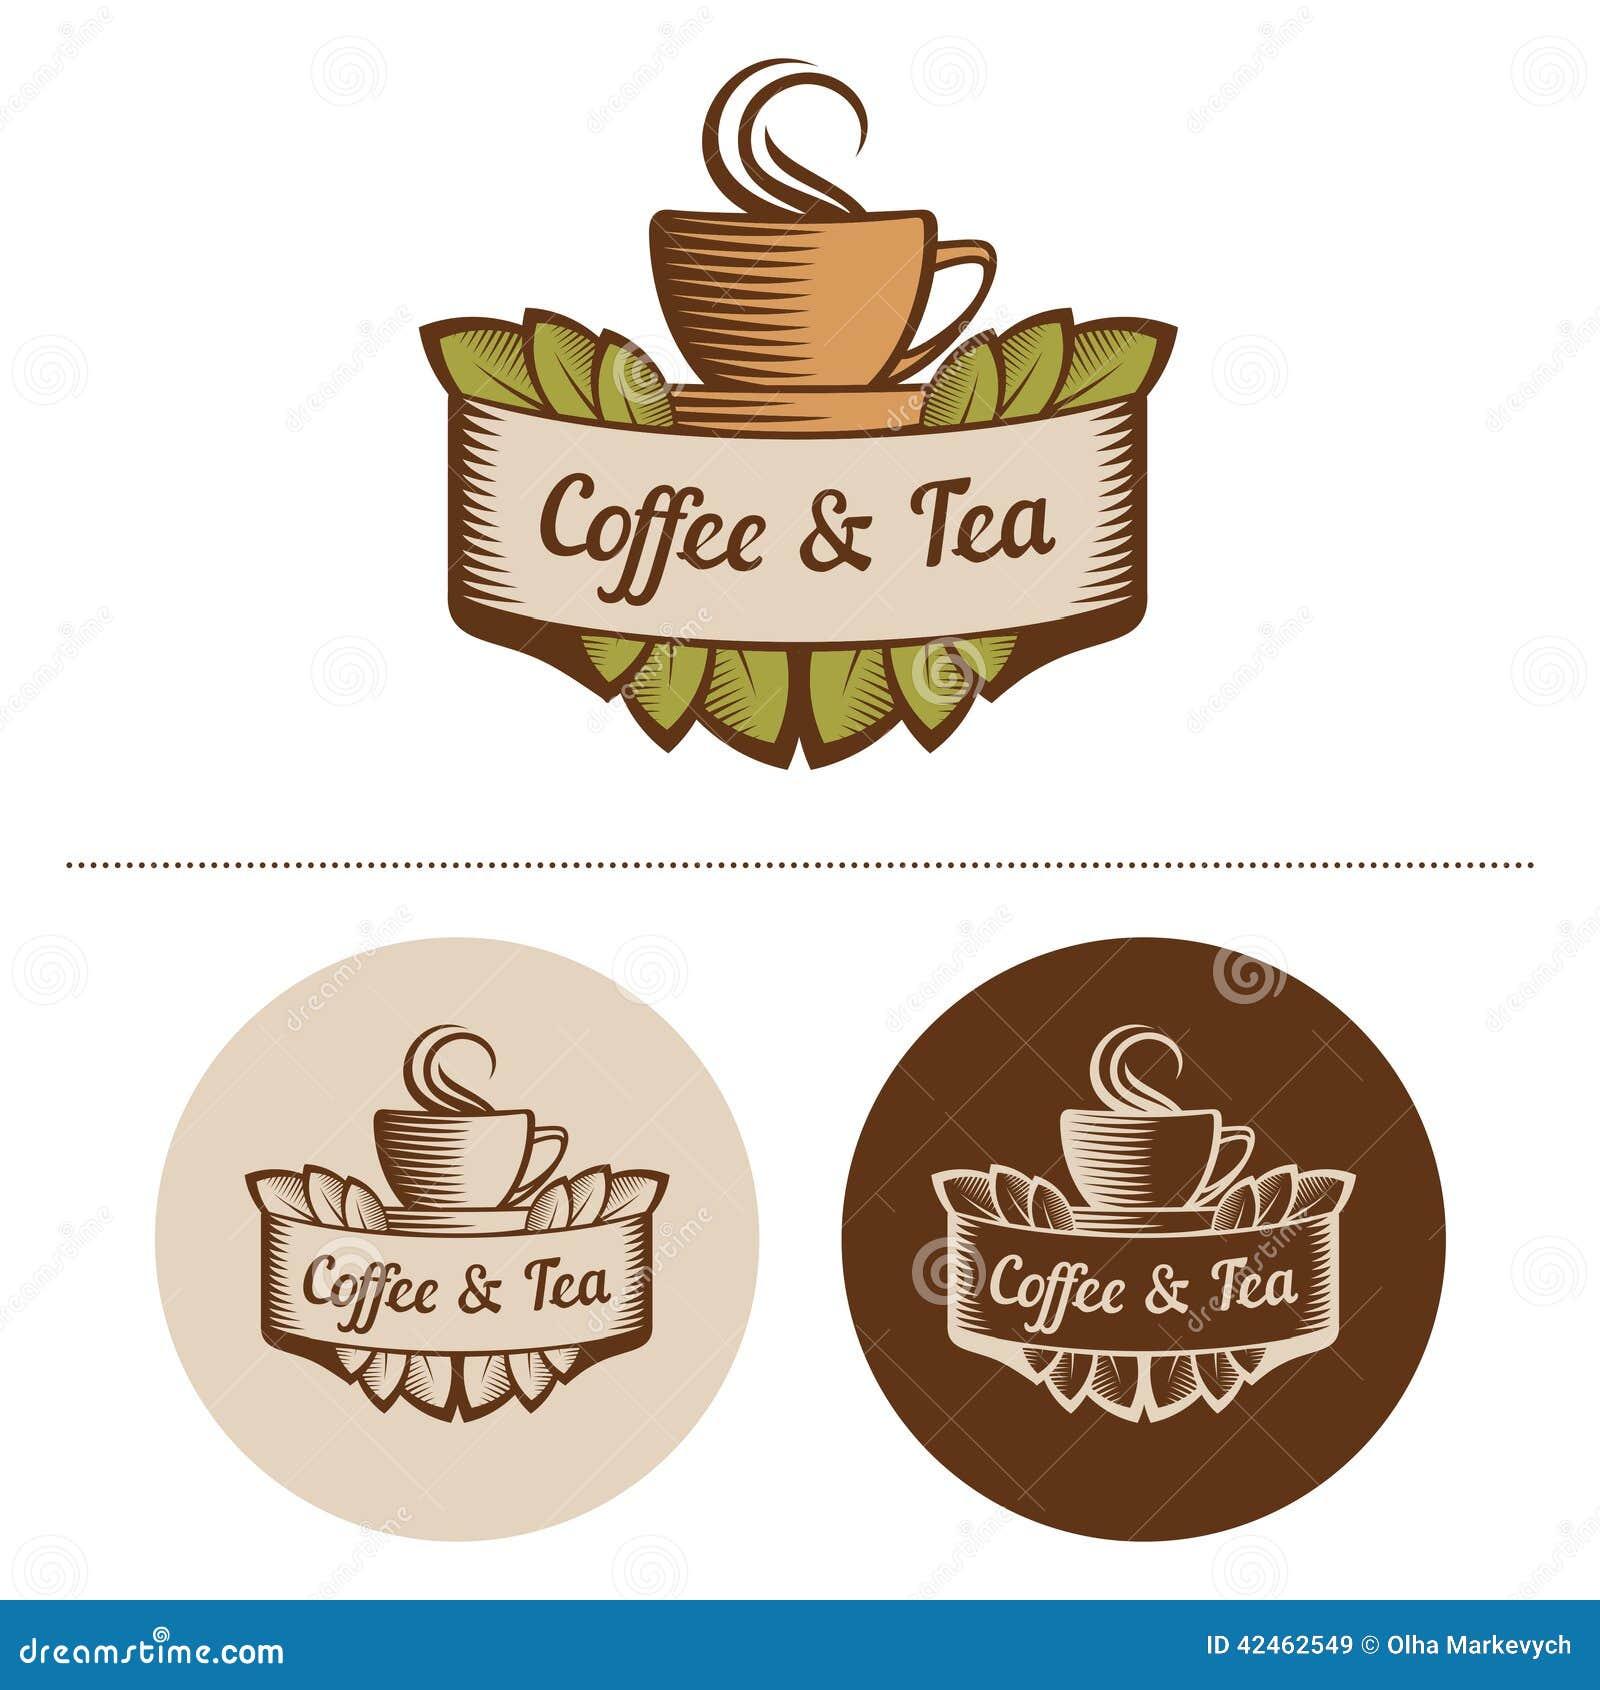 Kaffee und Tee Logo Template